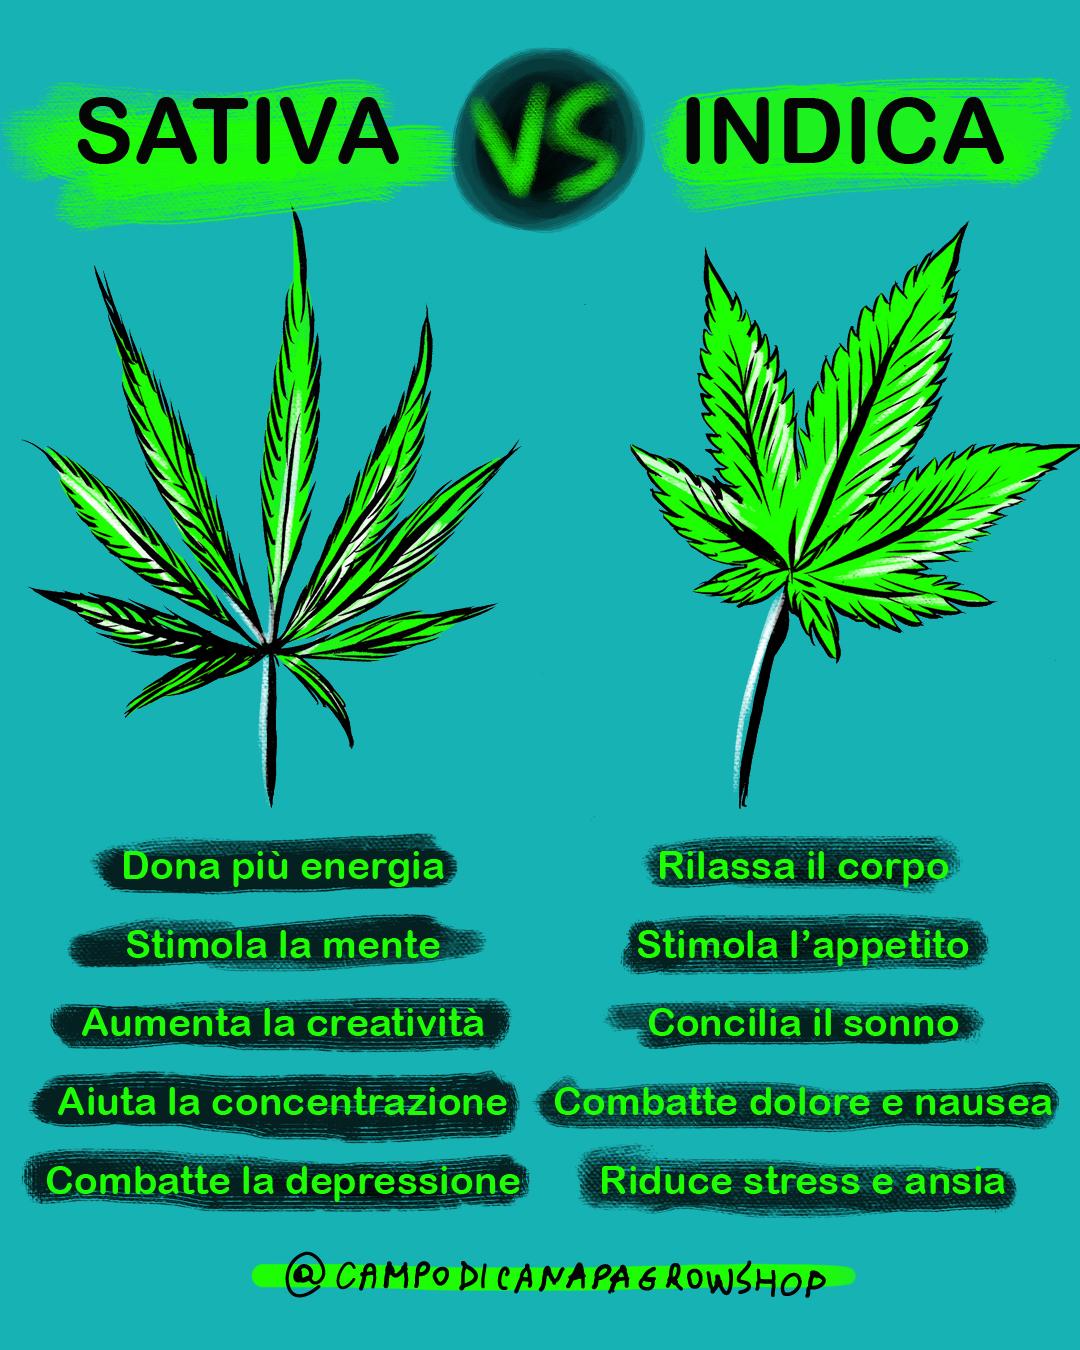 Indica Sativa differenze